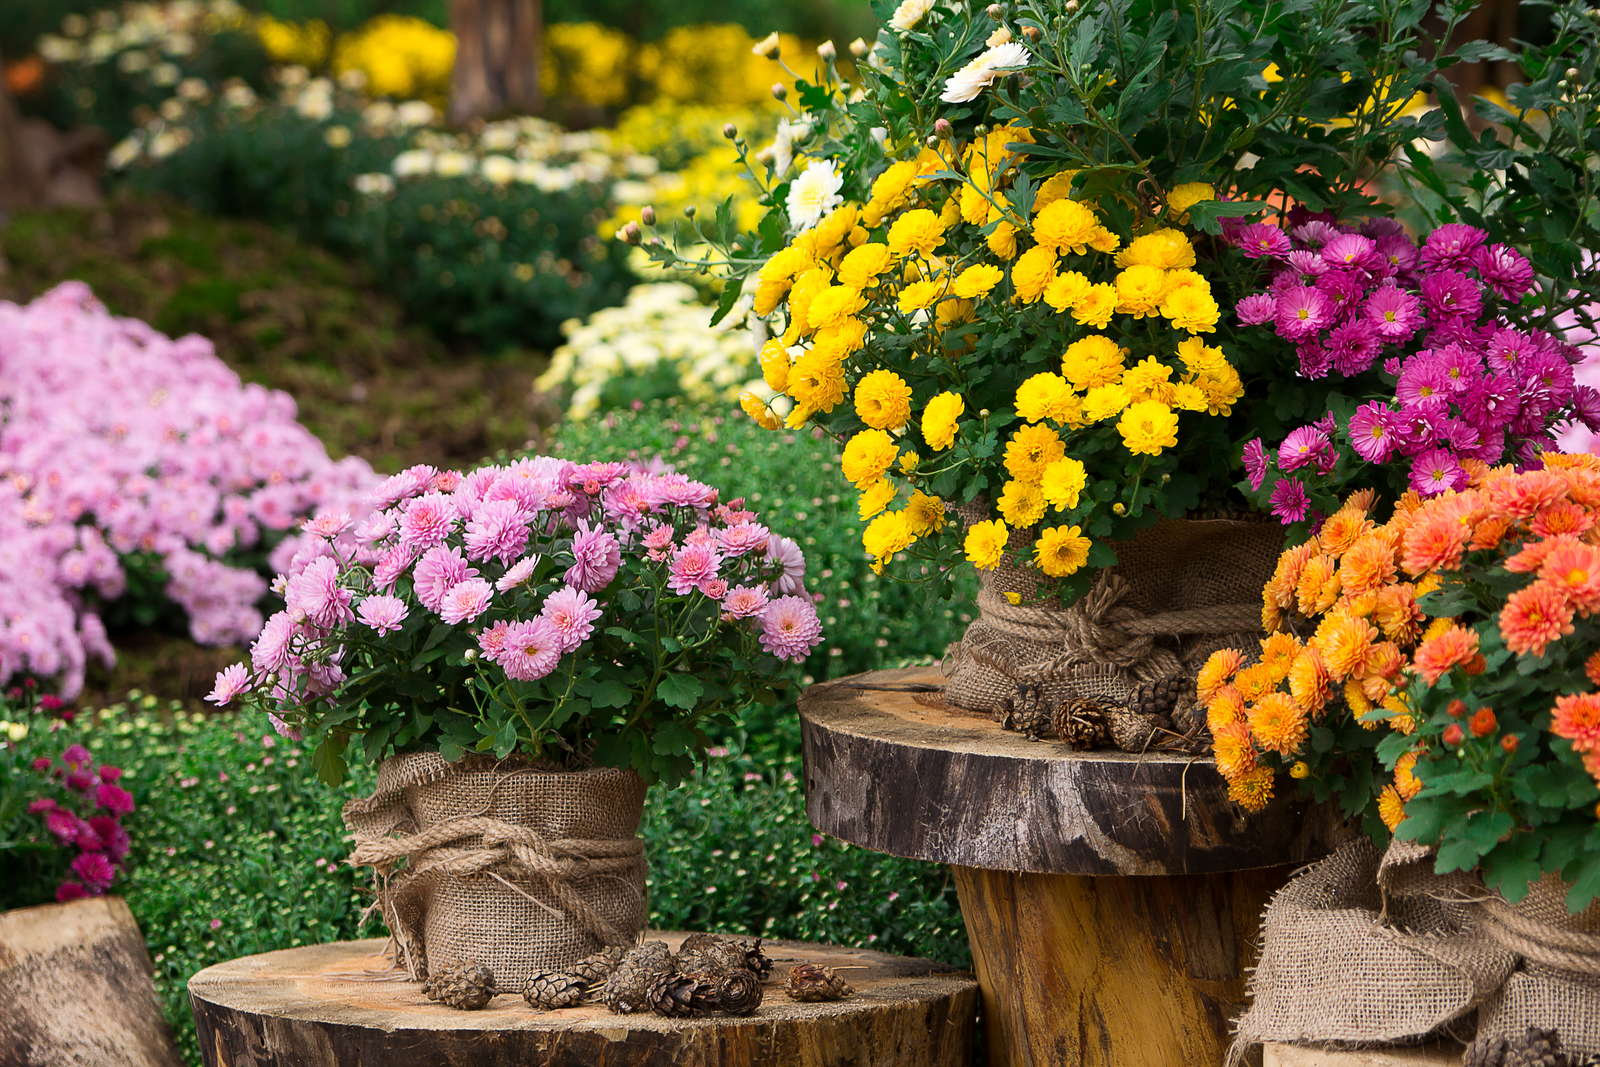 chrysanthemen arten chrysanthemum indicum andere sorten bersicht plantura. Black Bedroom Furniture Sets. Home Design Ideas